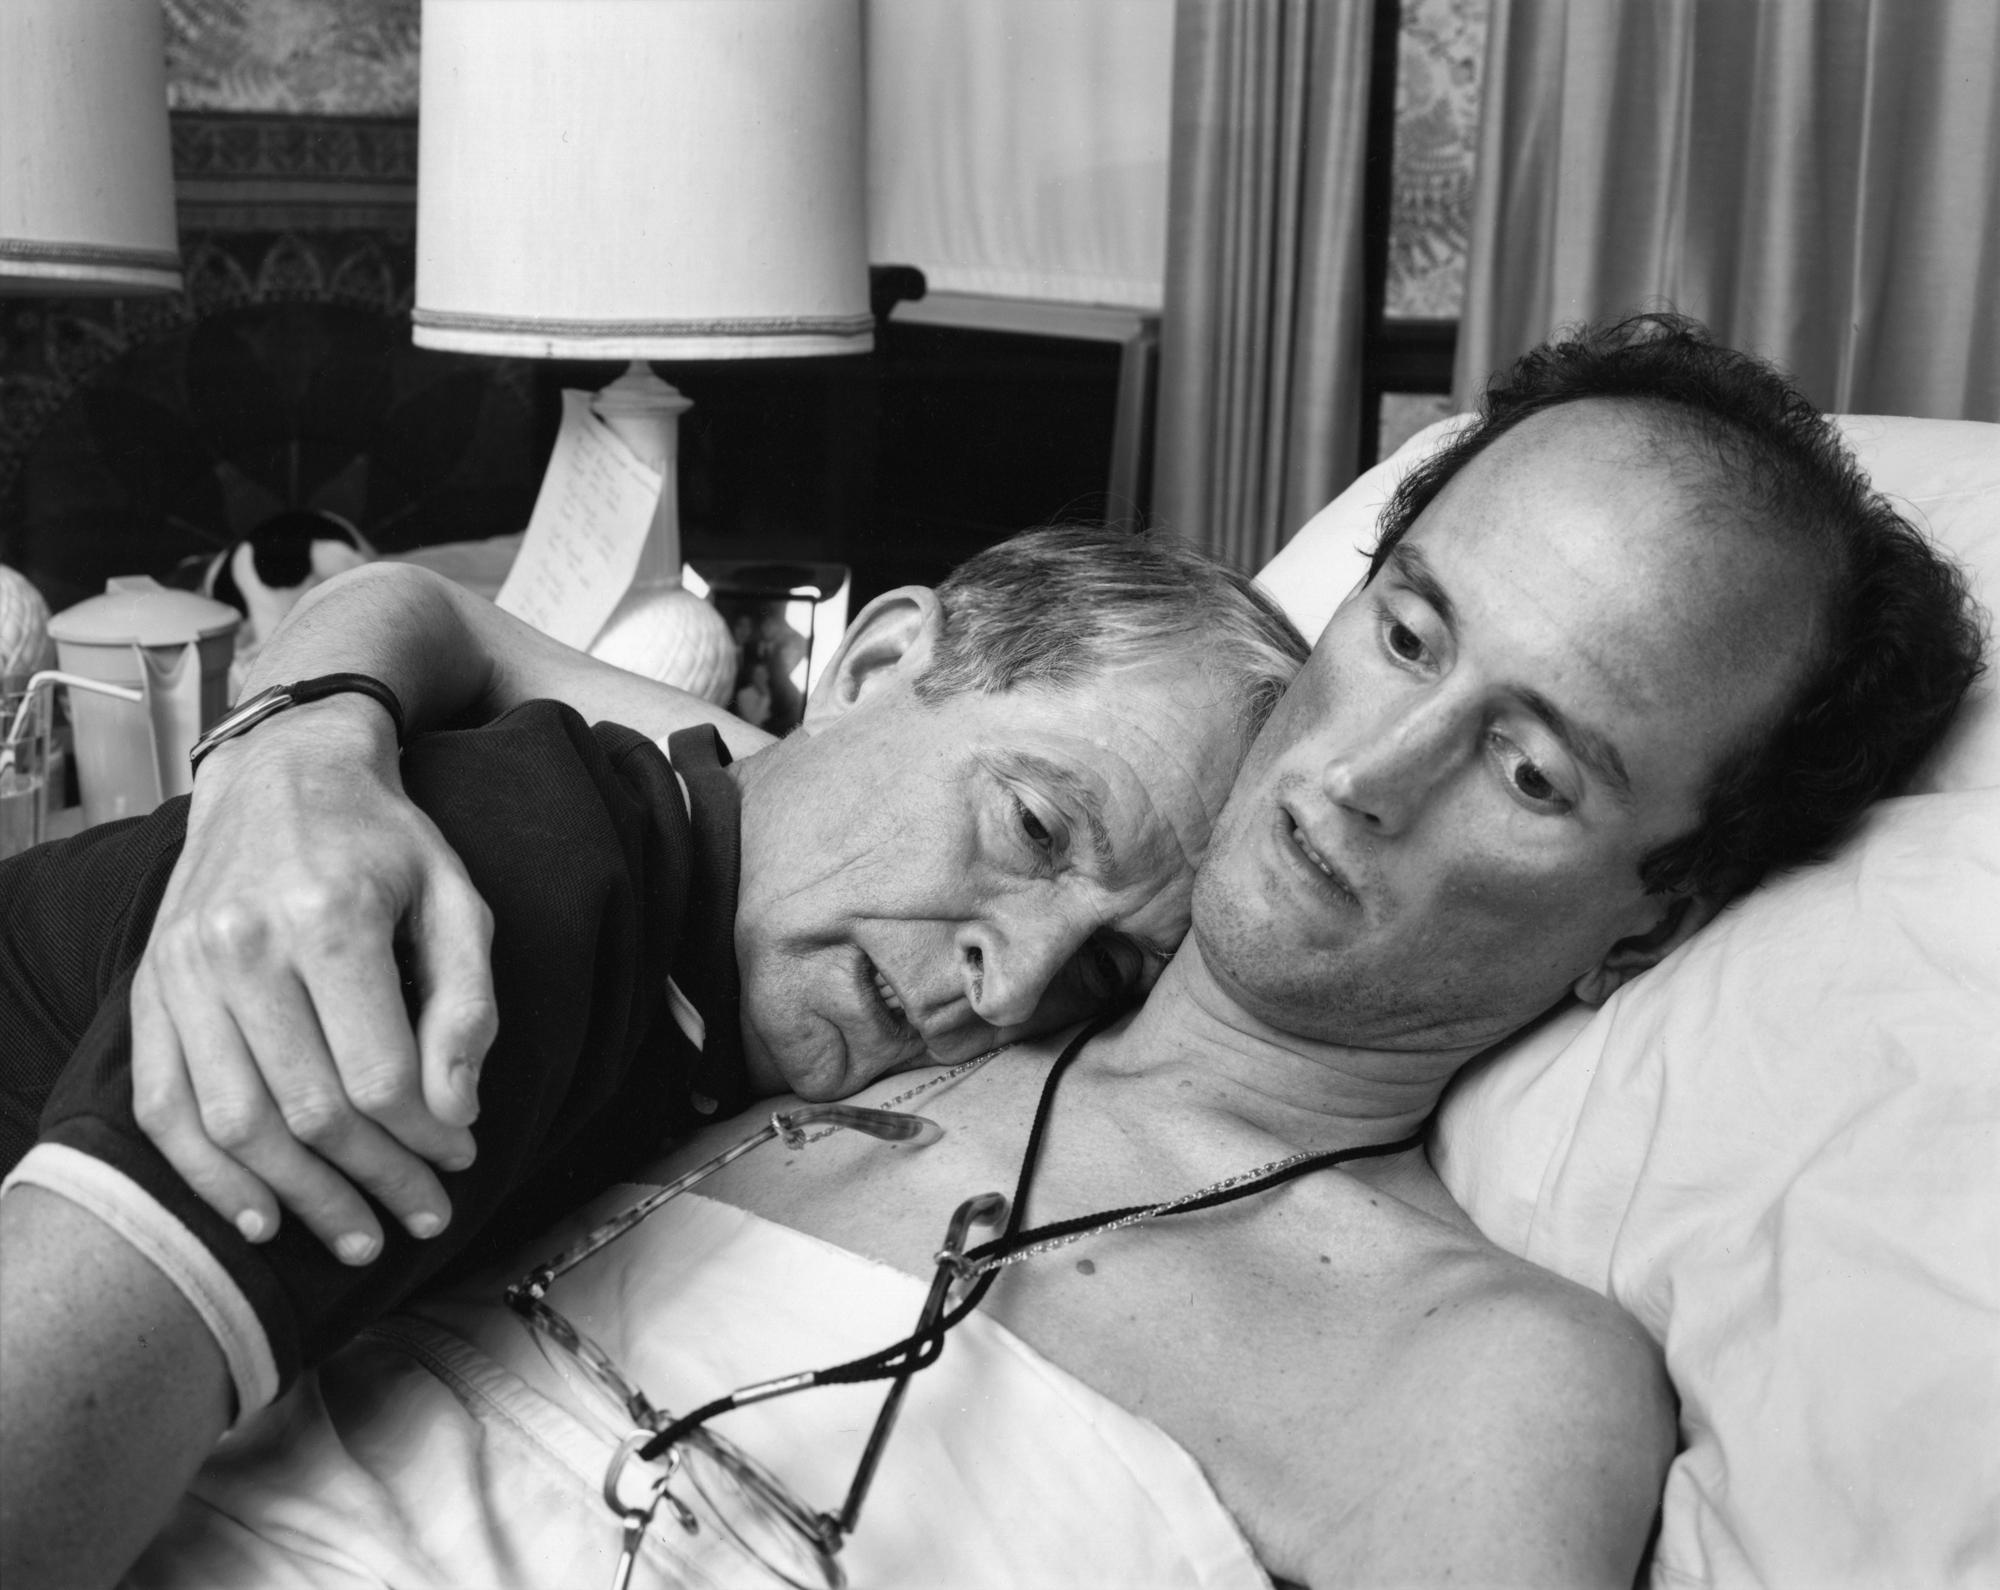 <em>Dr. Robert Sappenfield with his son Bob, Dorchester, 1988 | © Nicholas Nixon, courtesy Fraenkel Gallery, San Francisco</em>